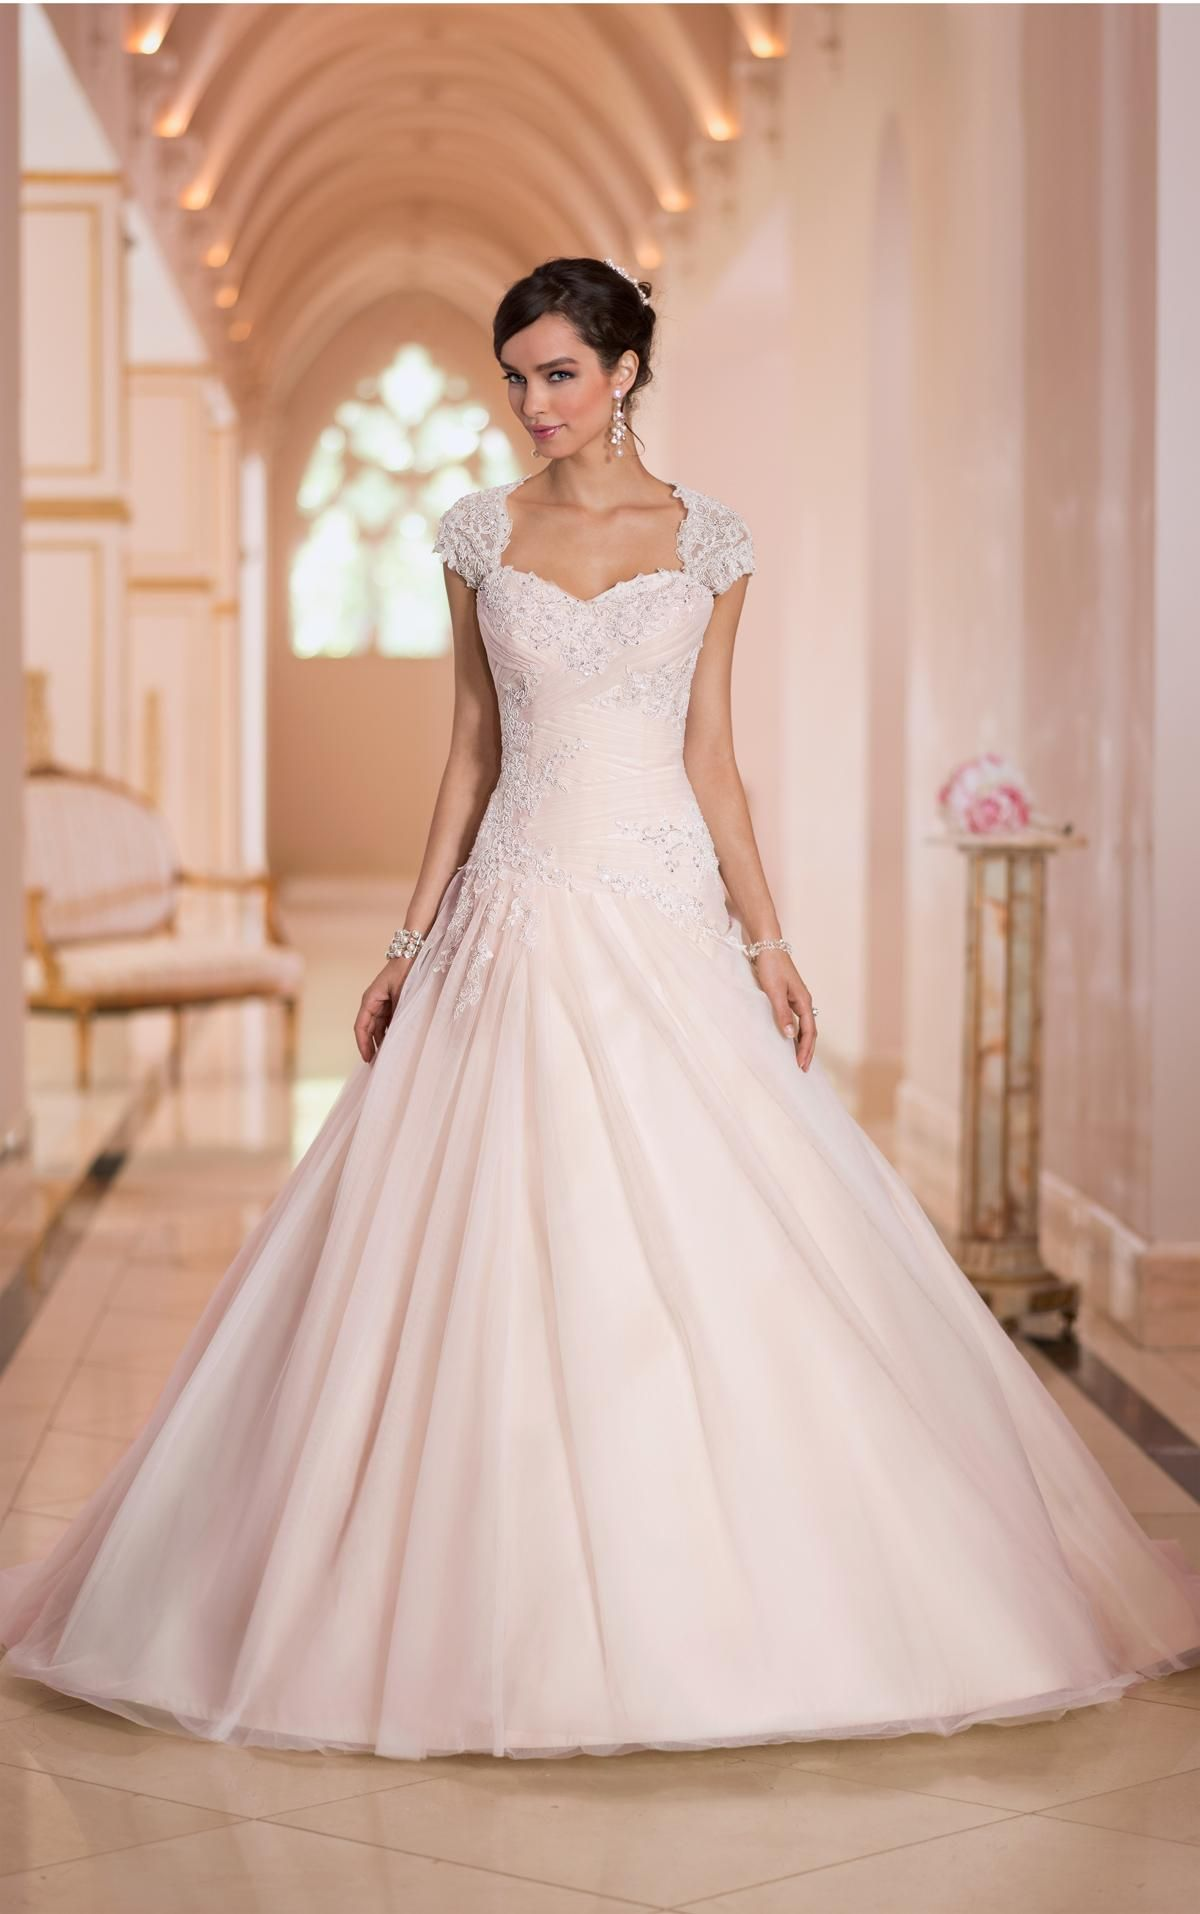 Mermaid Style Wedding Dresses 2016 New Cheap Wedding